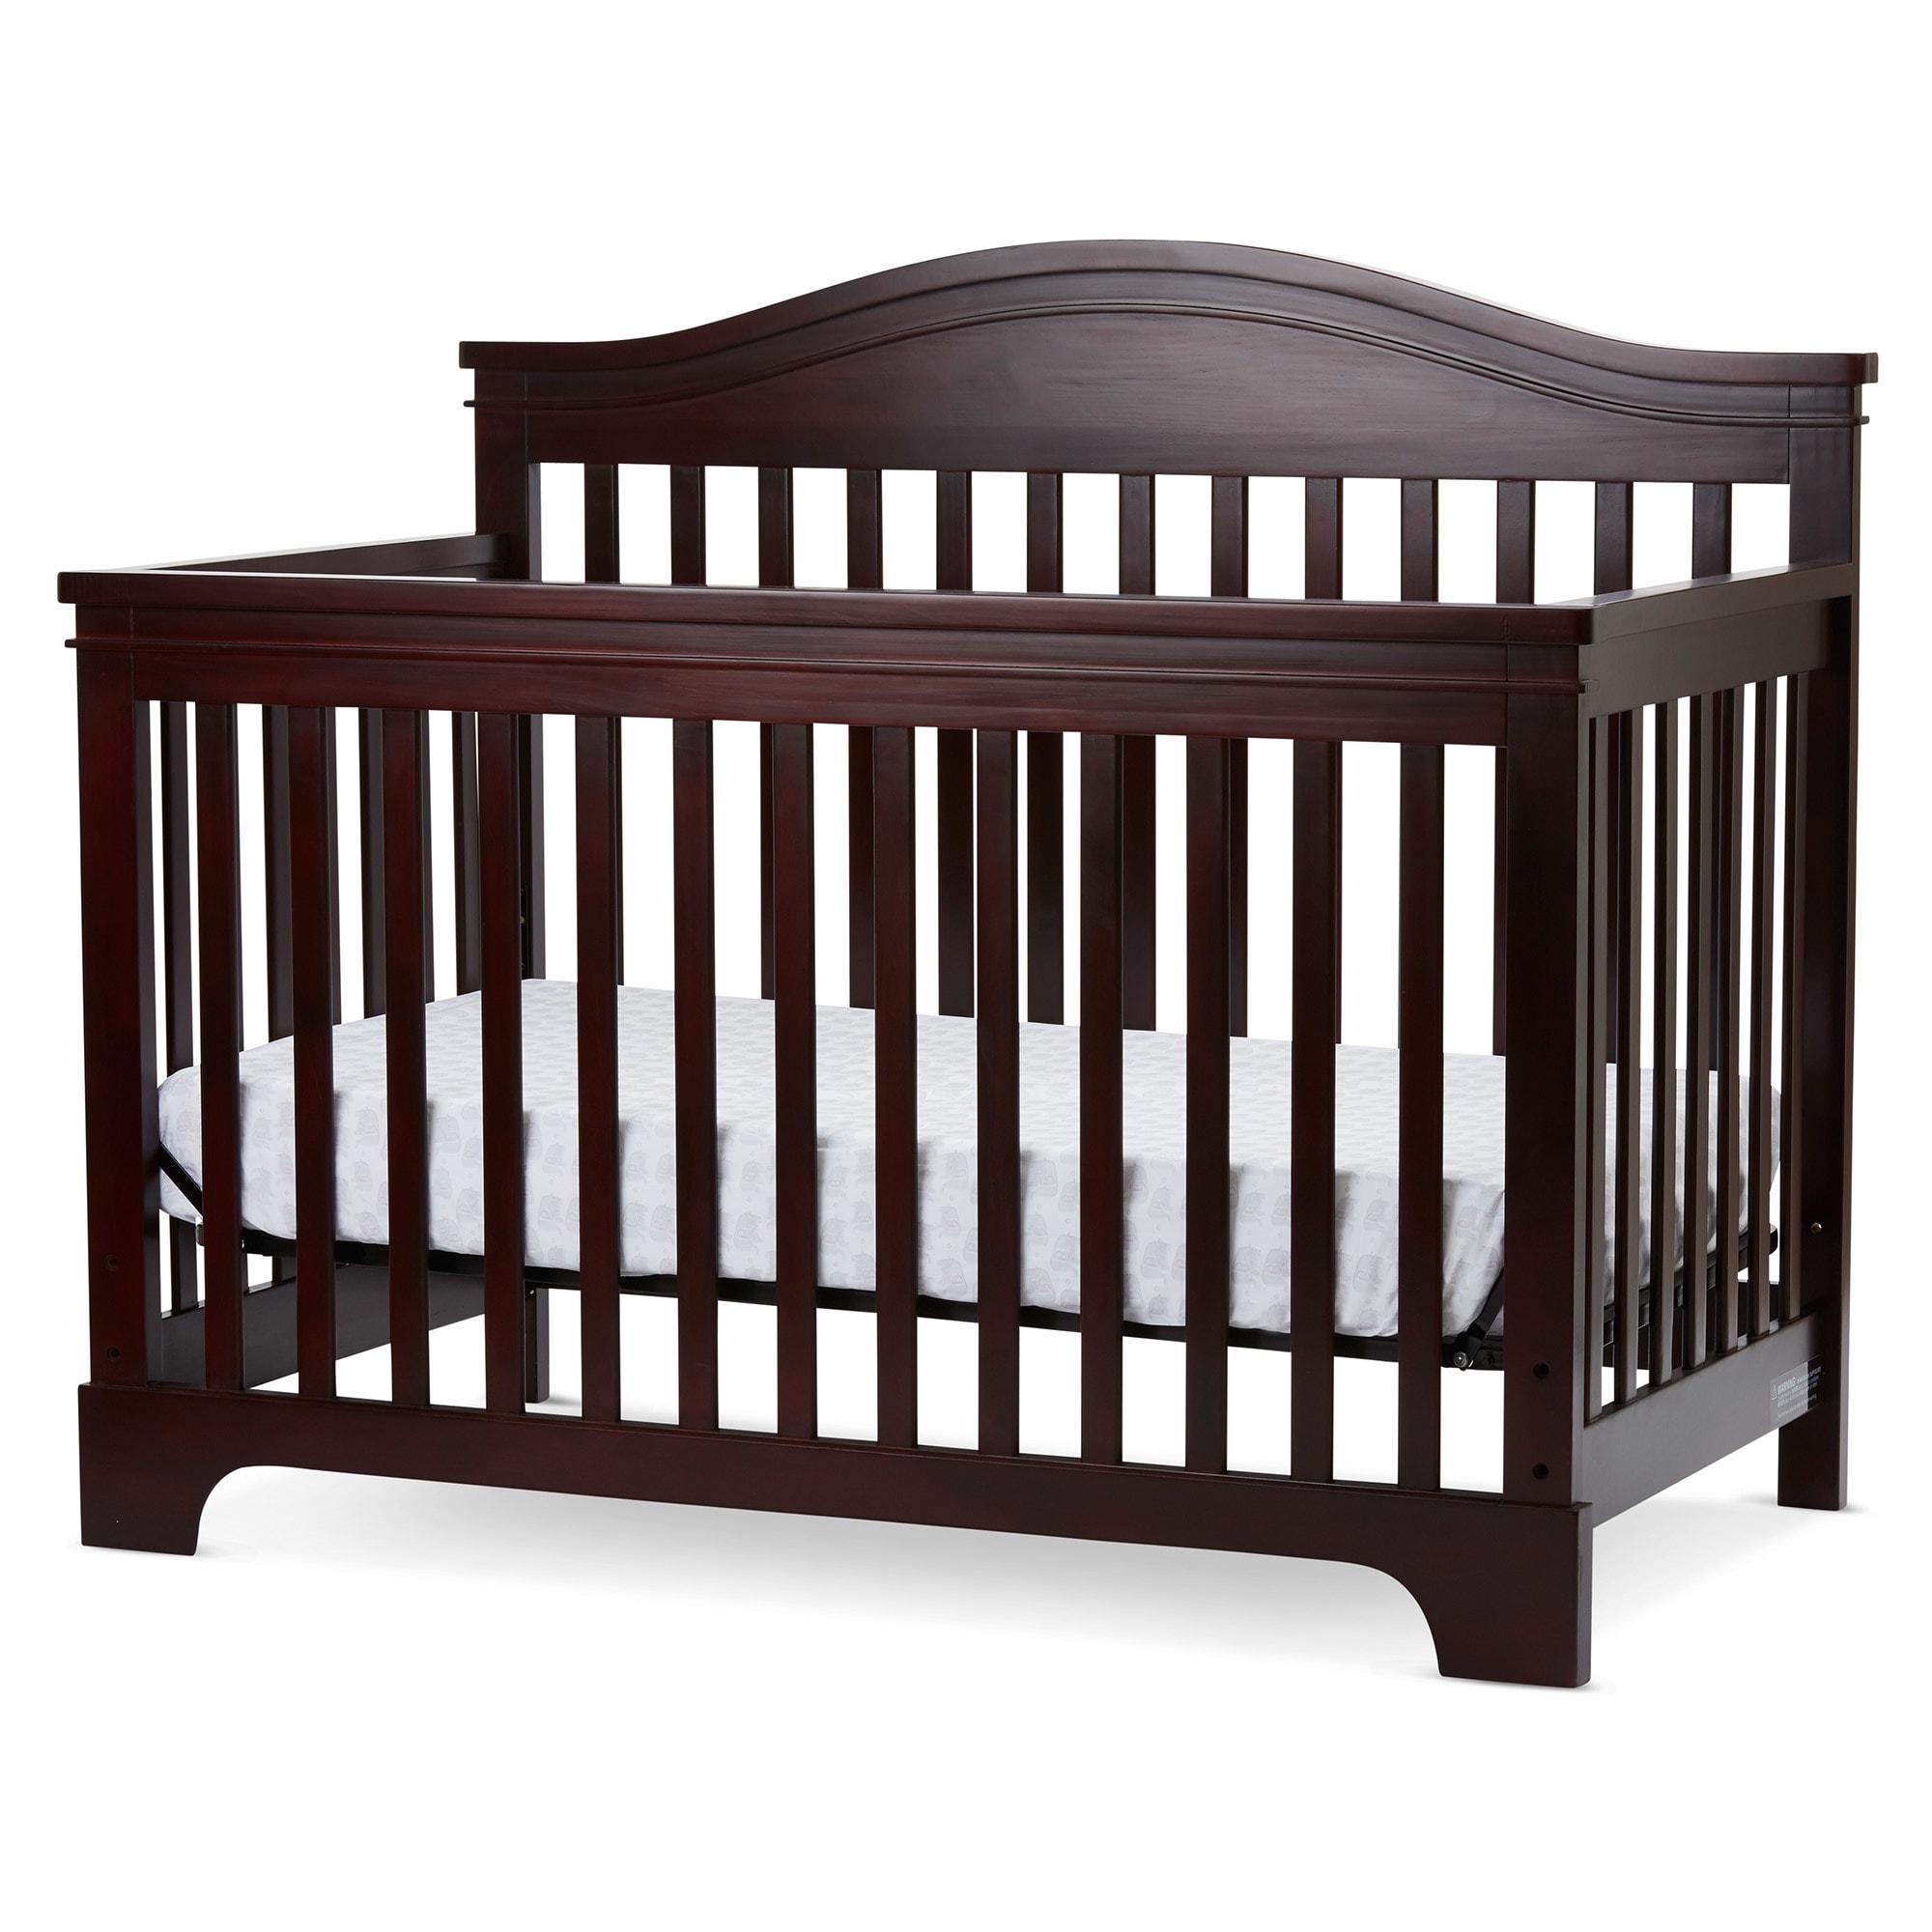 s in crib sleigh grey bennington products pop children elite baby convertible cribs charcoal dream delta